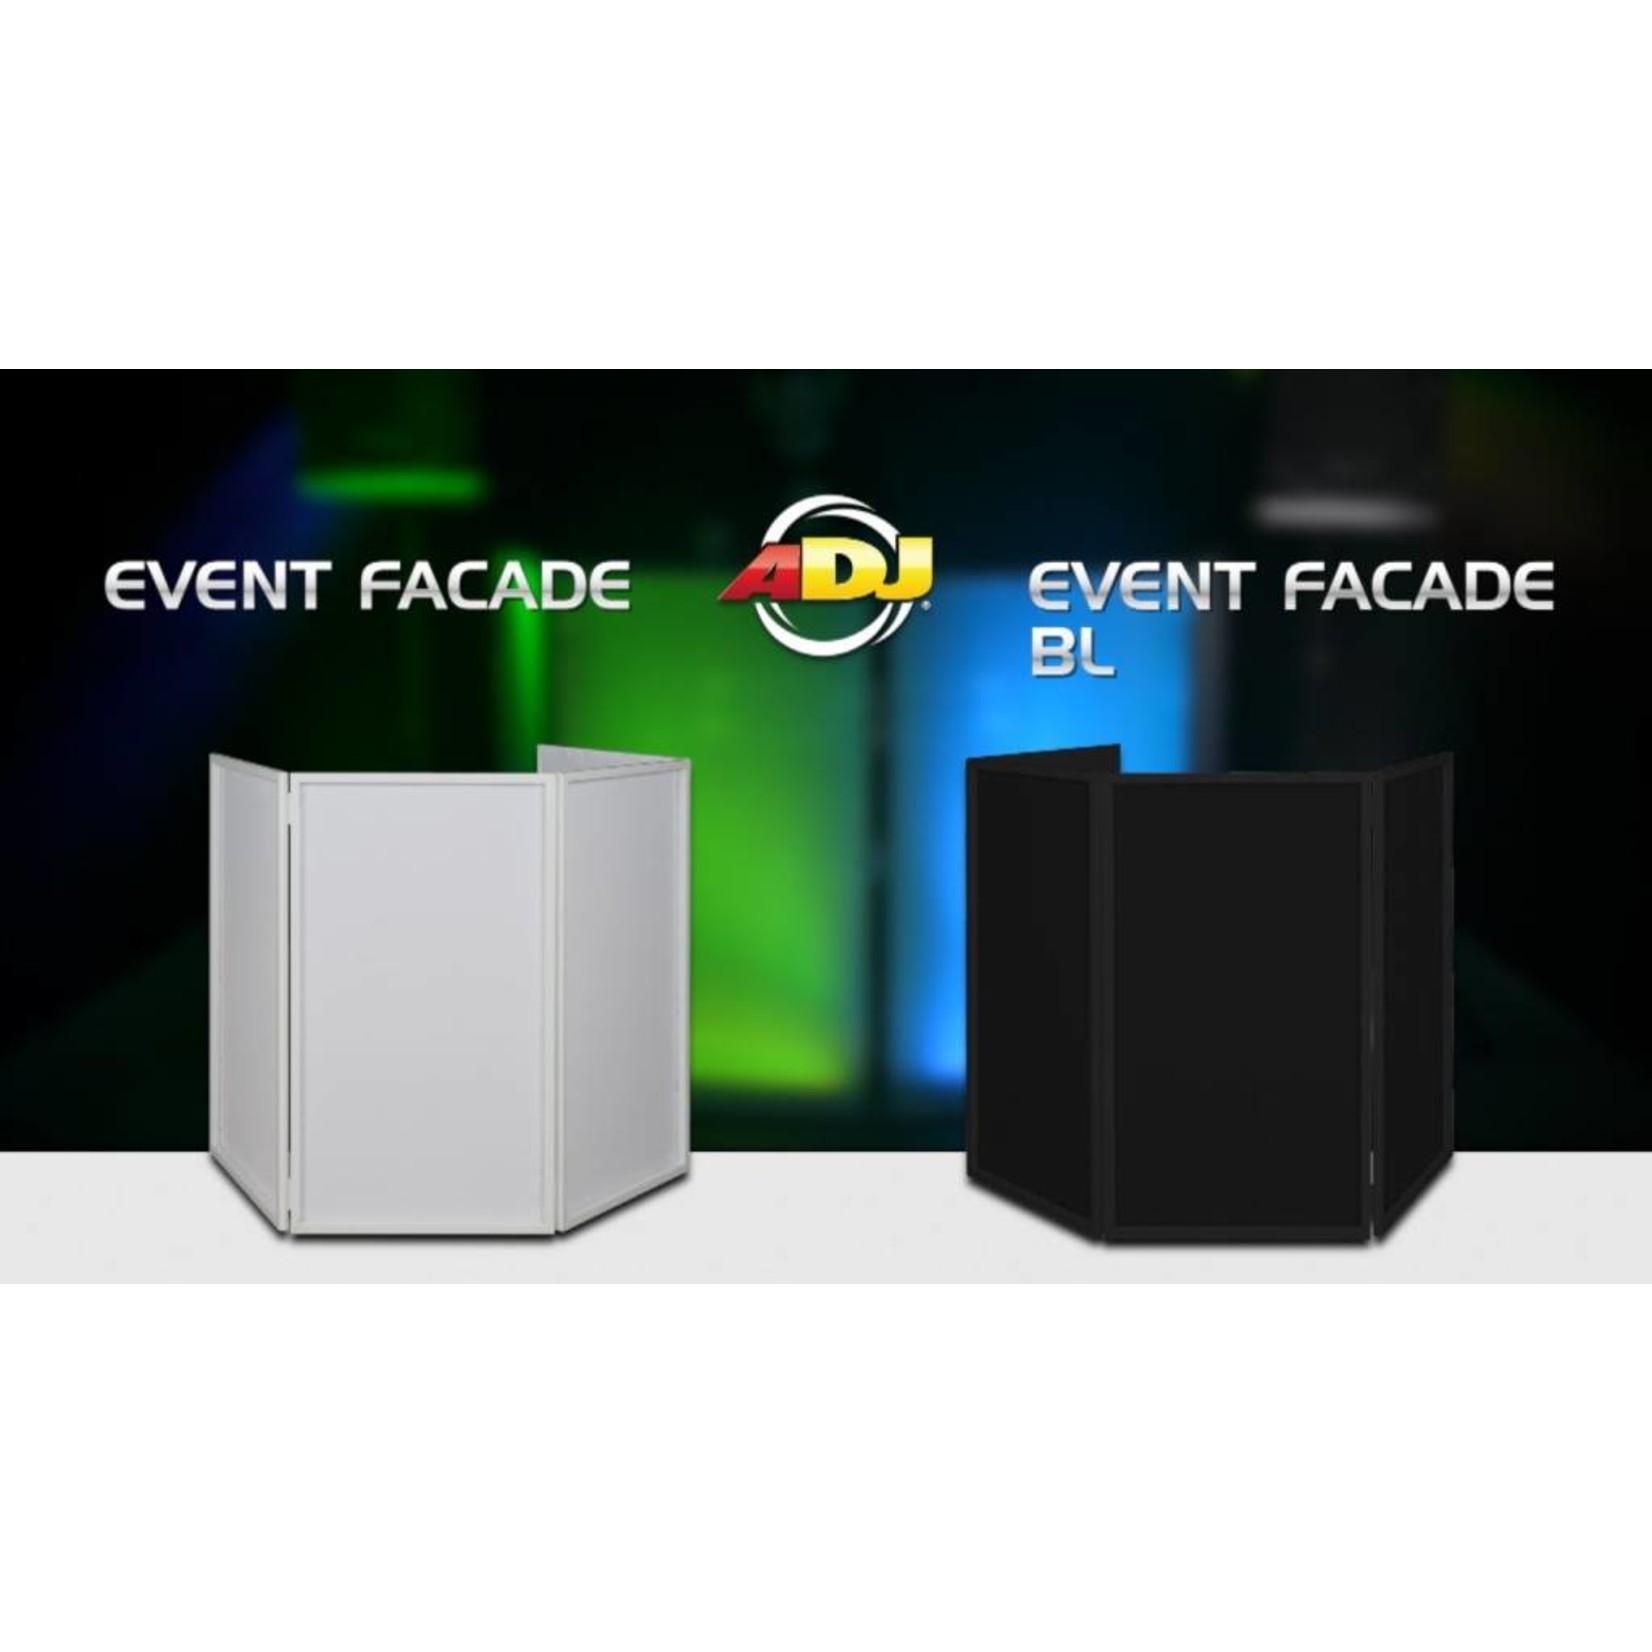 AMERICAN DJ EVENT FACADE ADJ